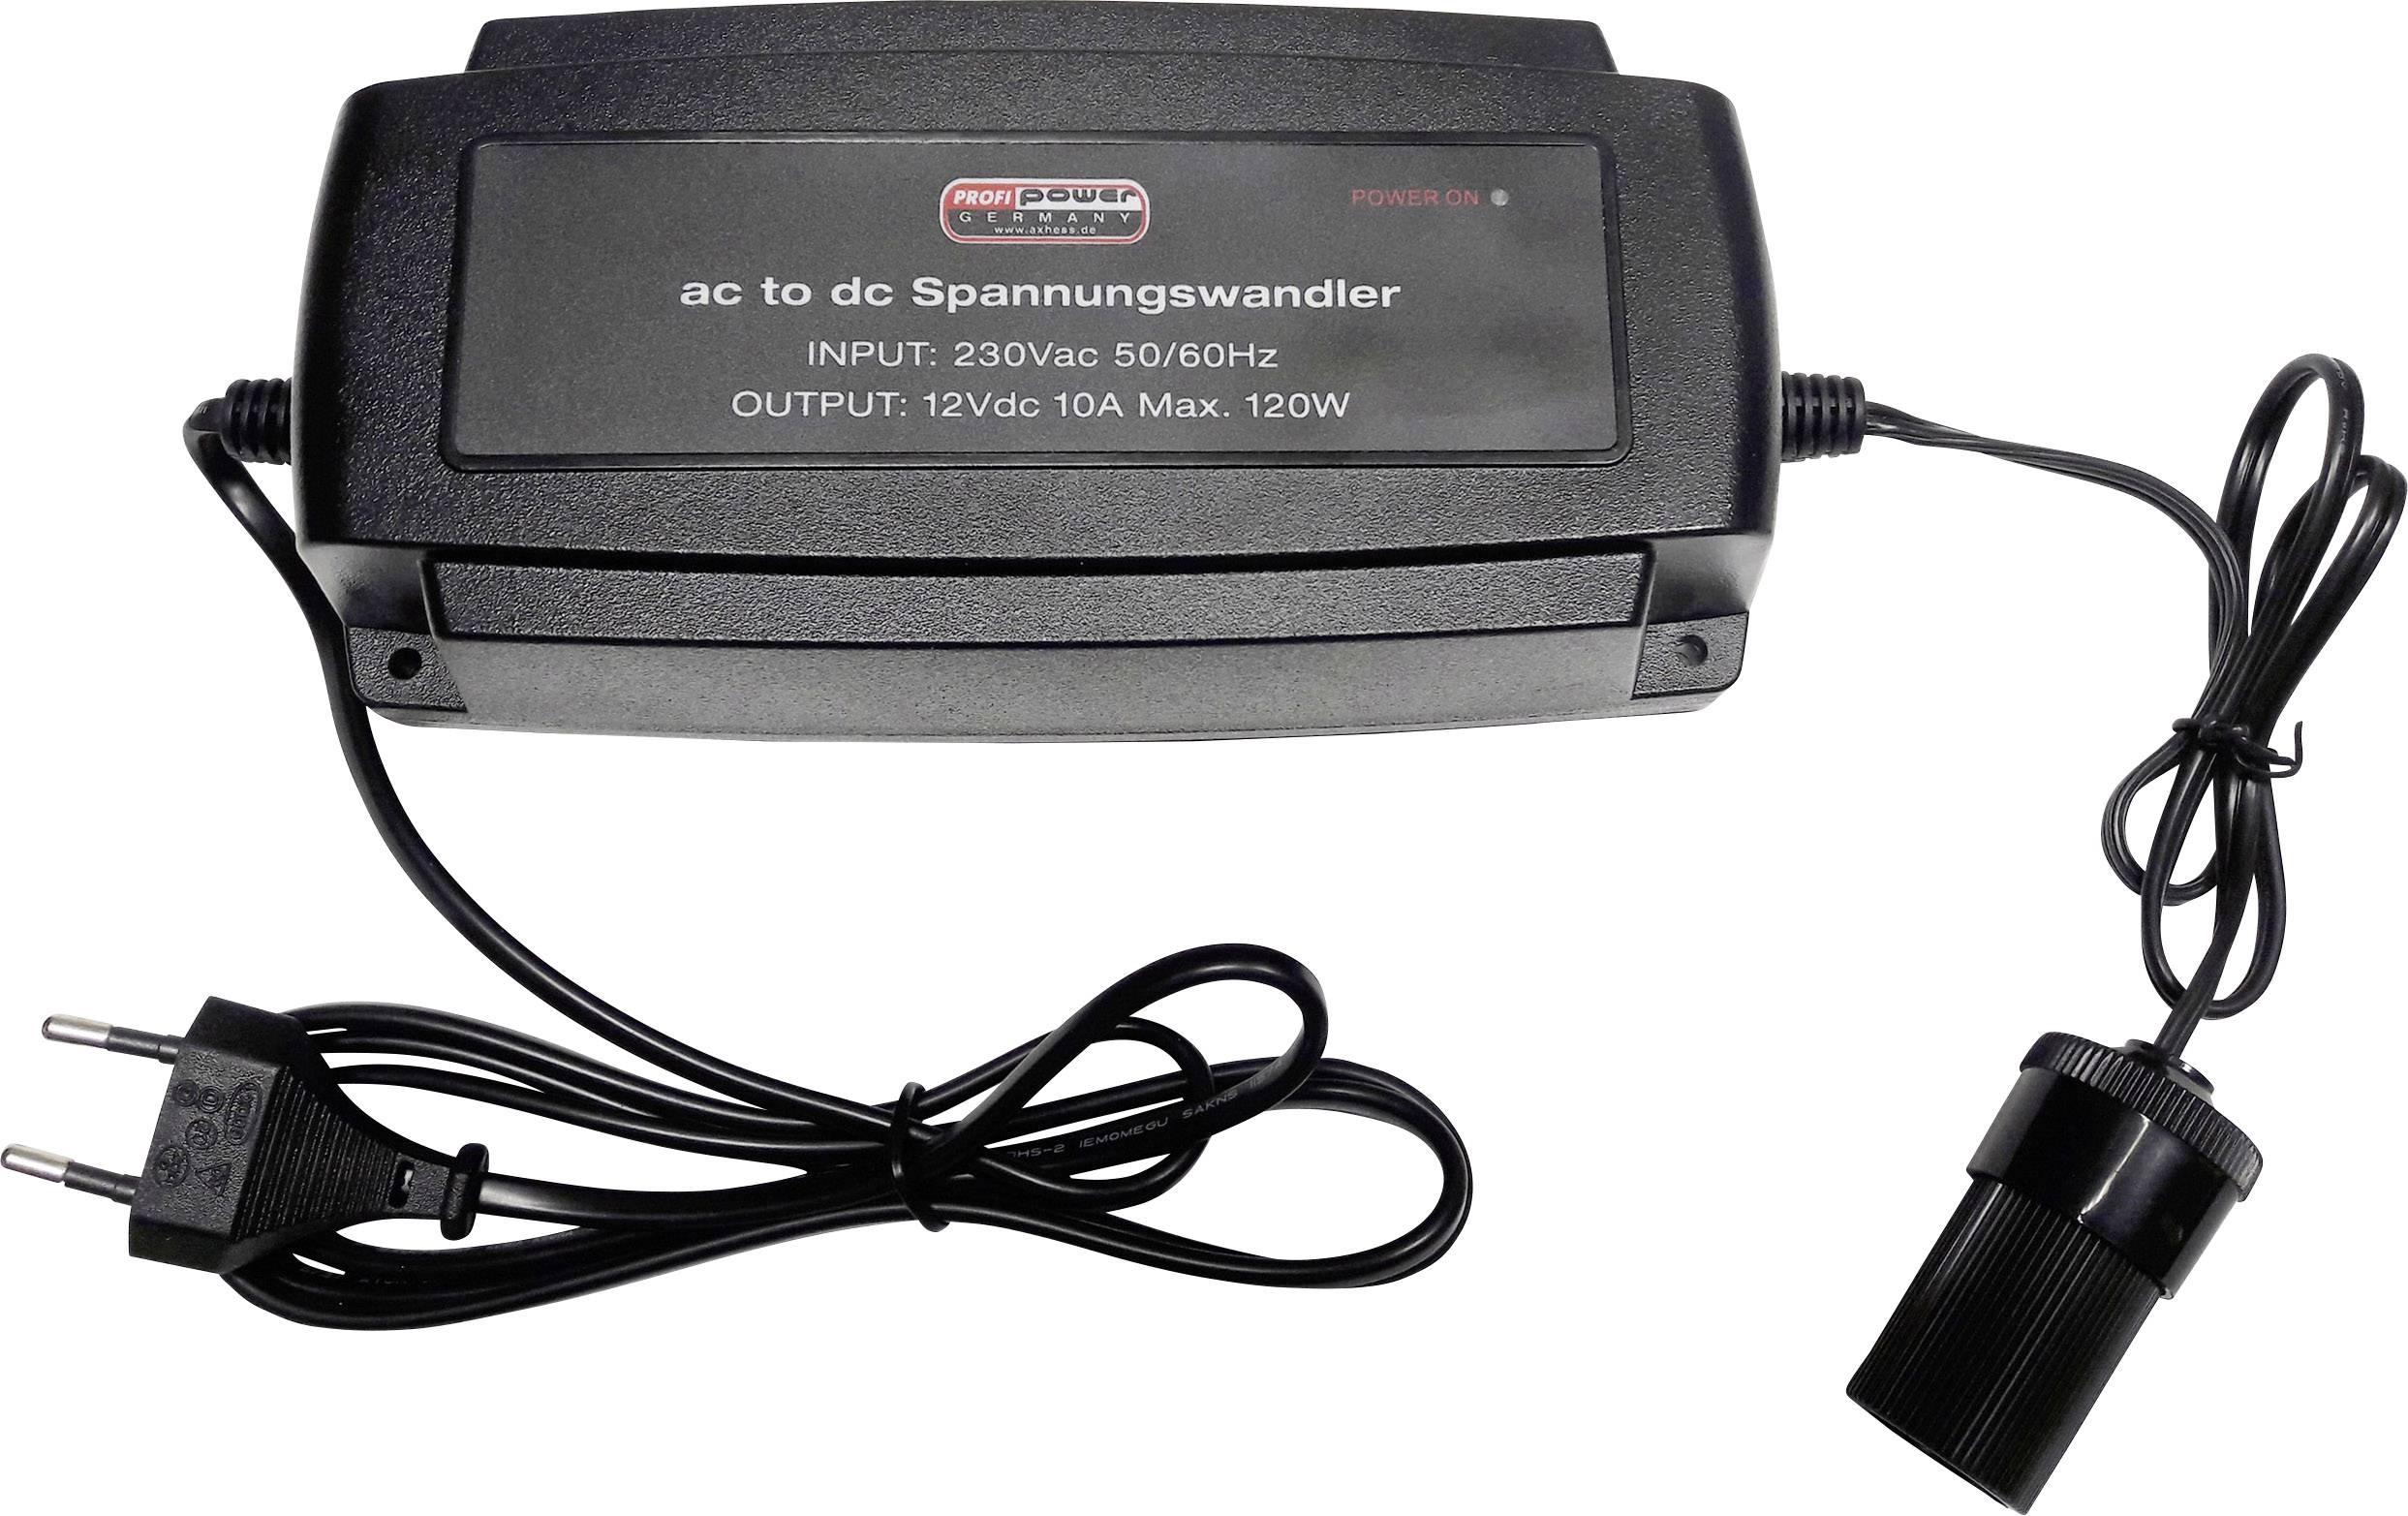 Menič napätia Profi Power Converter 10A, (d x š x v) 210 x 95 x 55 mm, 1 ks, čierna